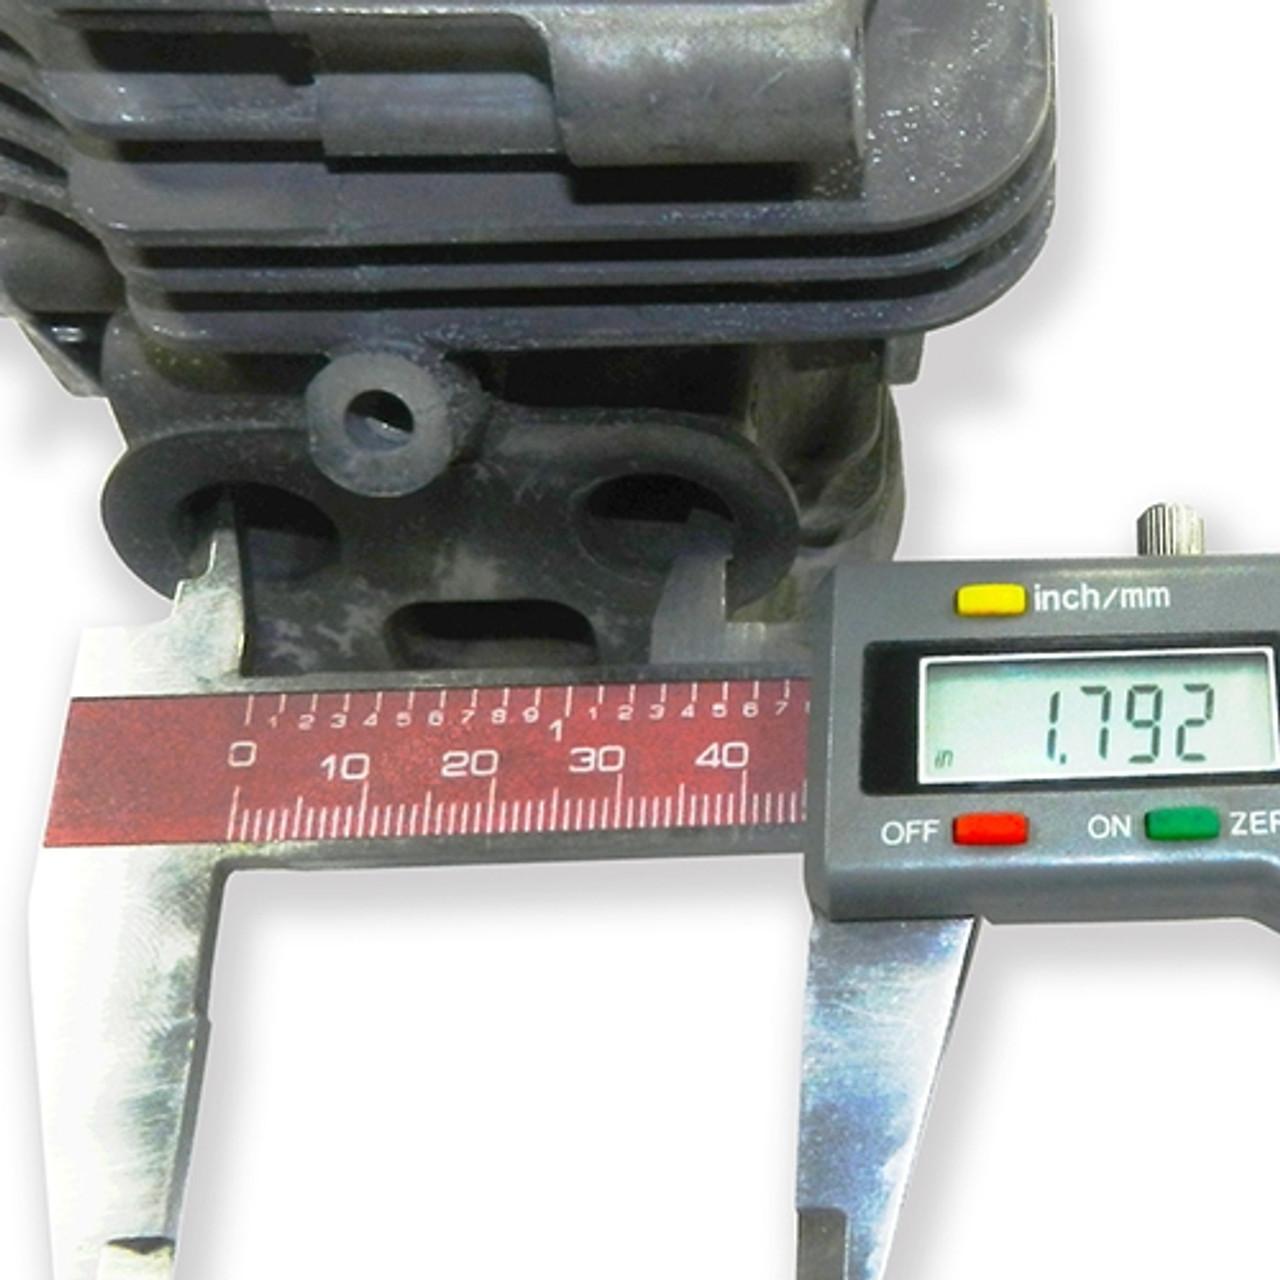 Cross Performance Husqvarna Partner  K760 11 (New Style) Nikasil Cylinder,  Piston Rebuild Kit 581476101